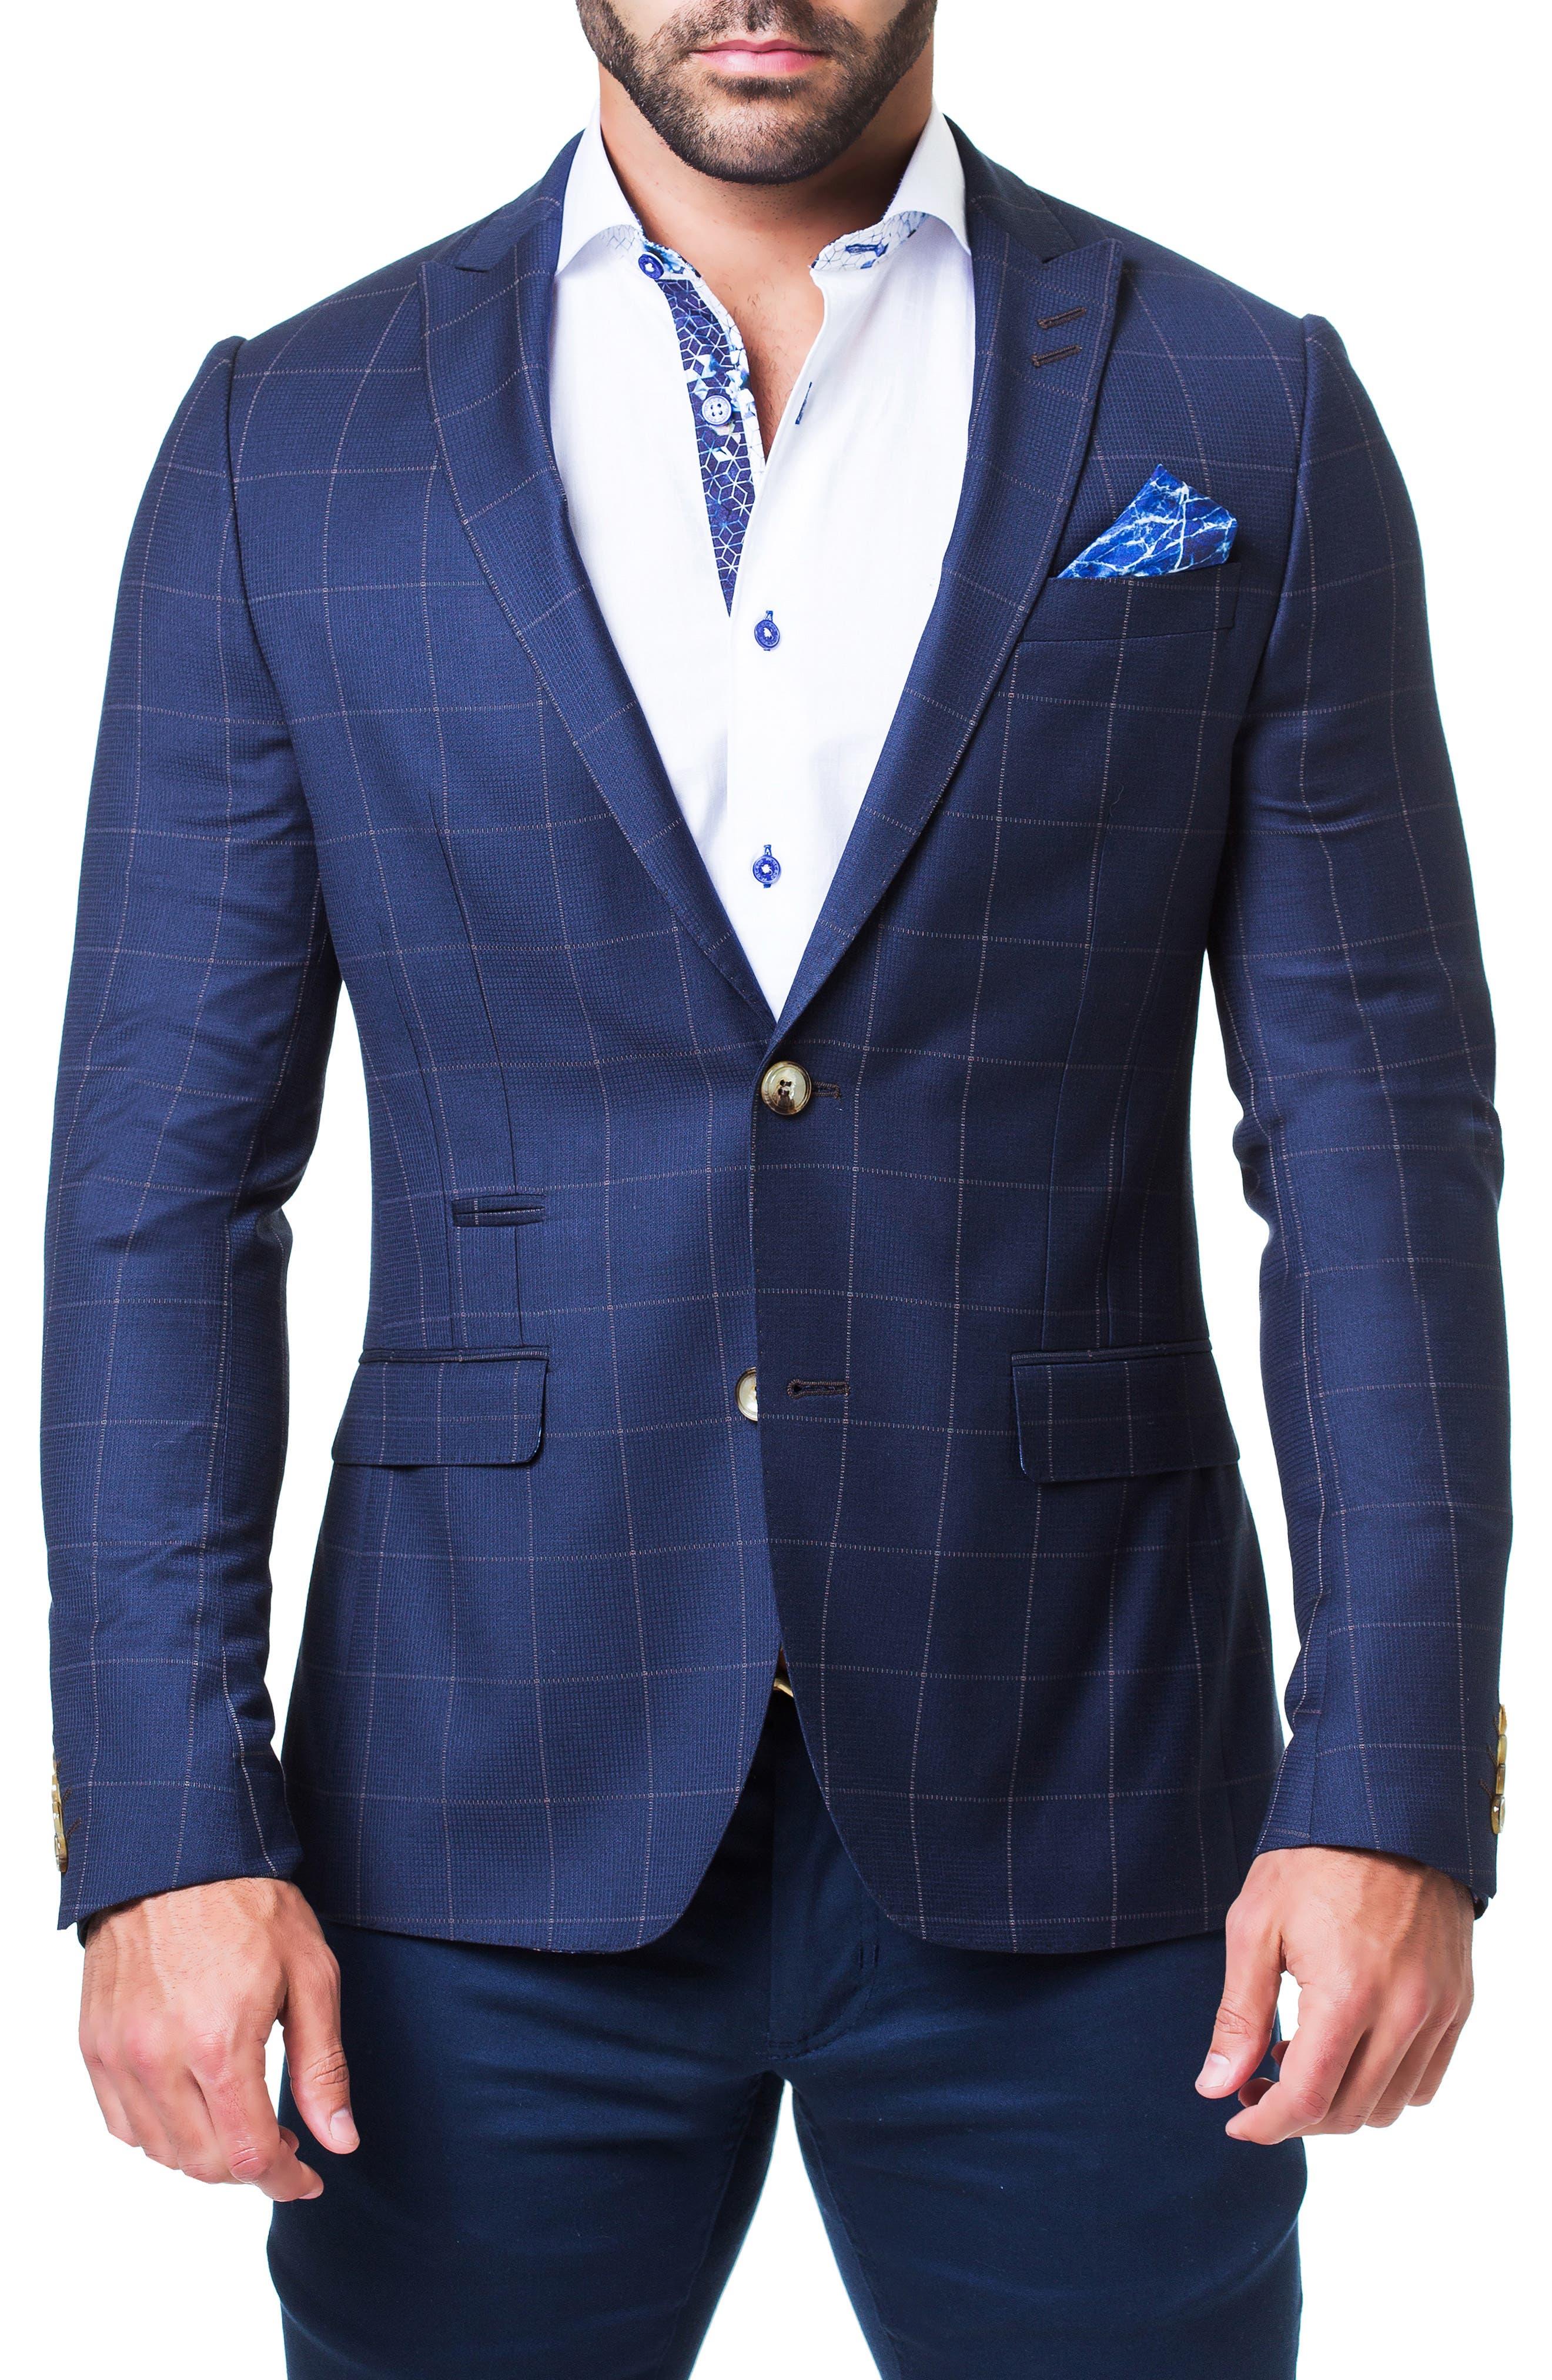 MACEOO Plaid Sport Coat in Blue